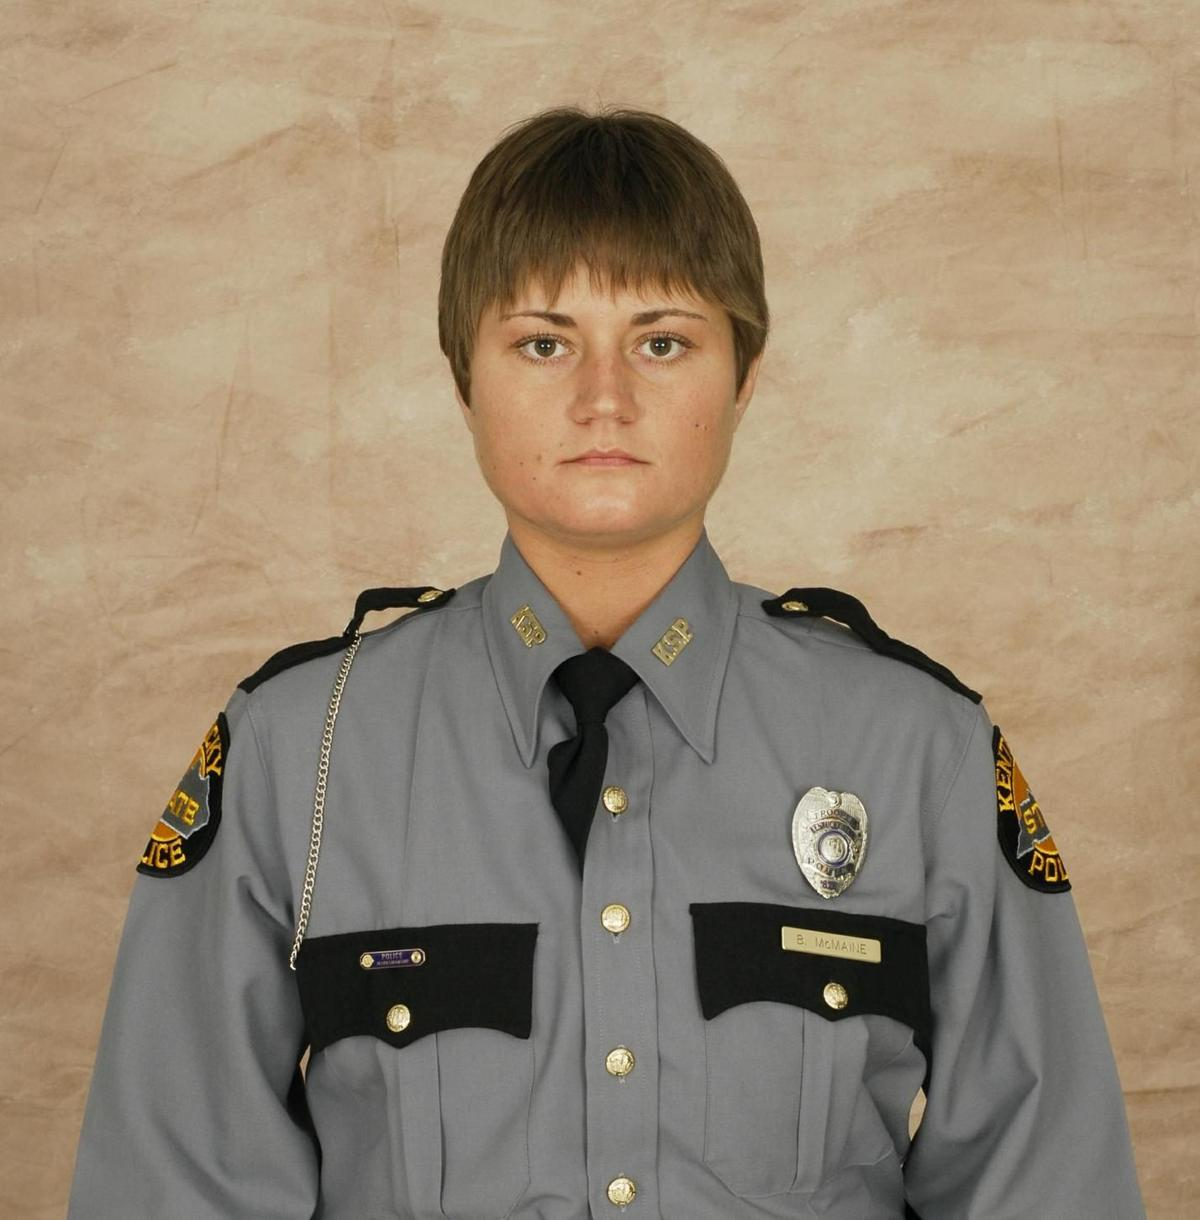 Kentucky graduates 62 state troopers | News | herald